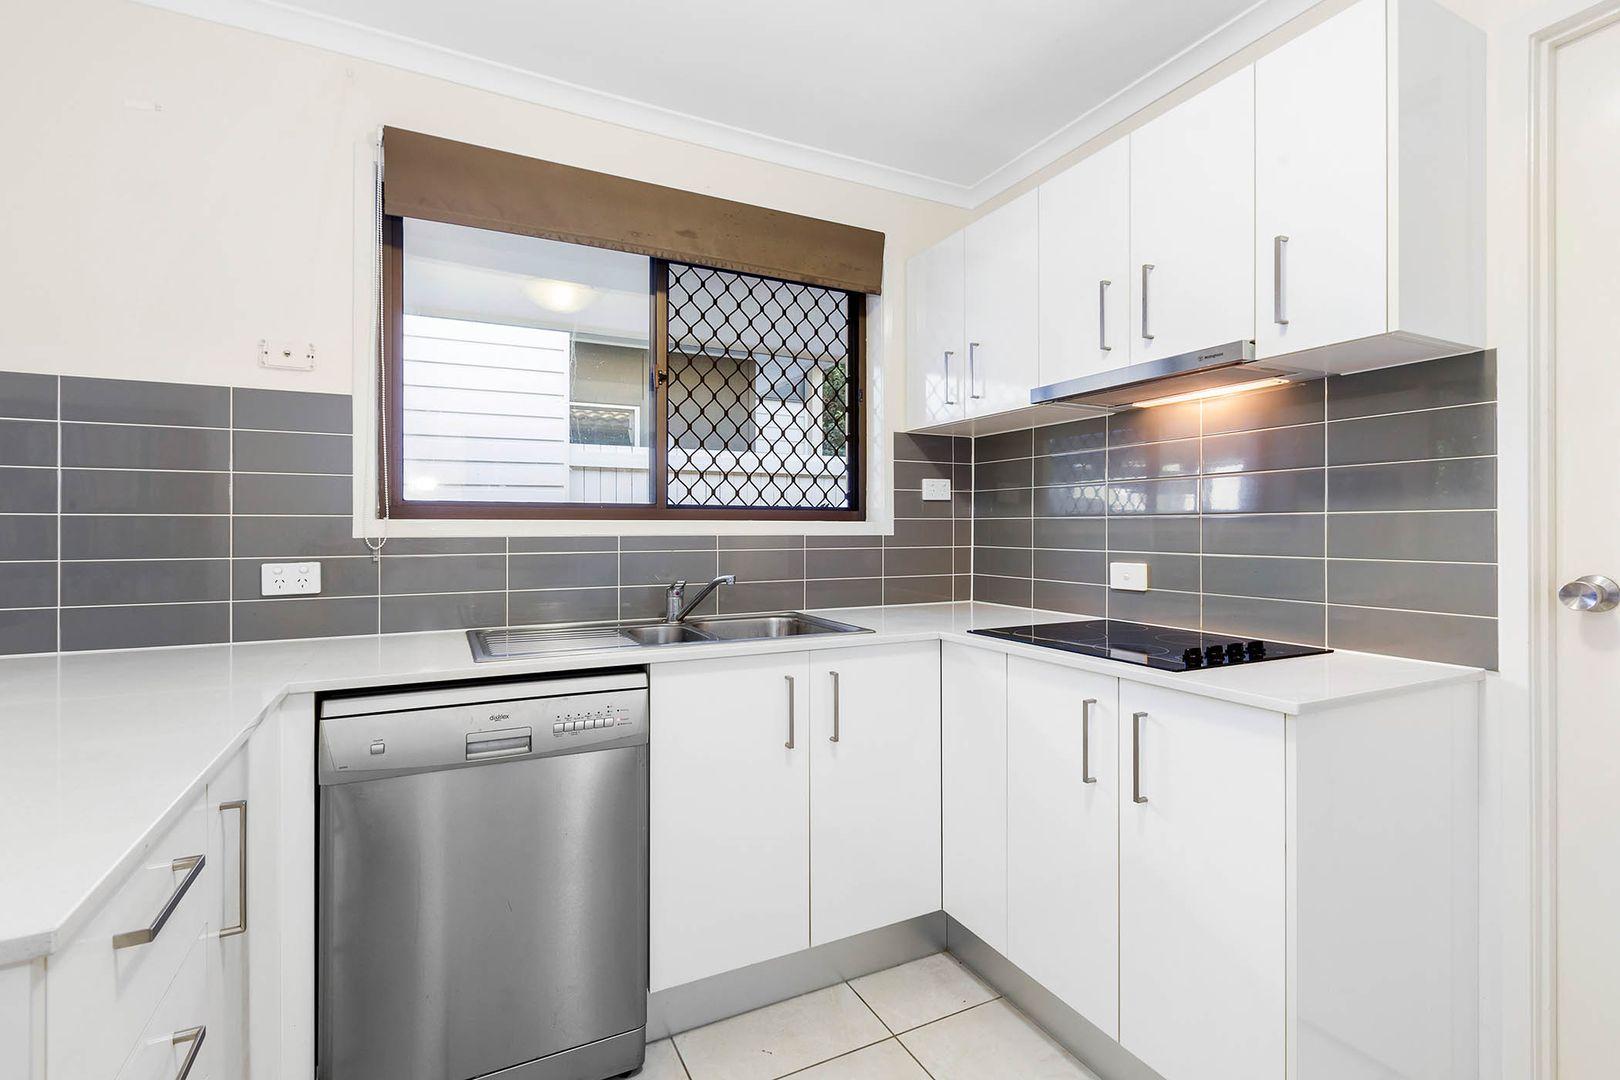 2/51 Lovegrove Street, Zillmere QLD 4034, Image 2